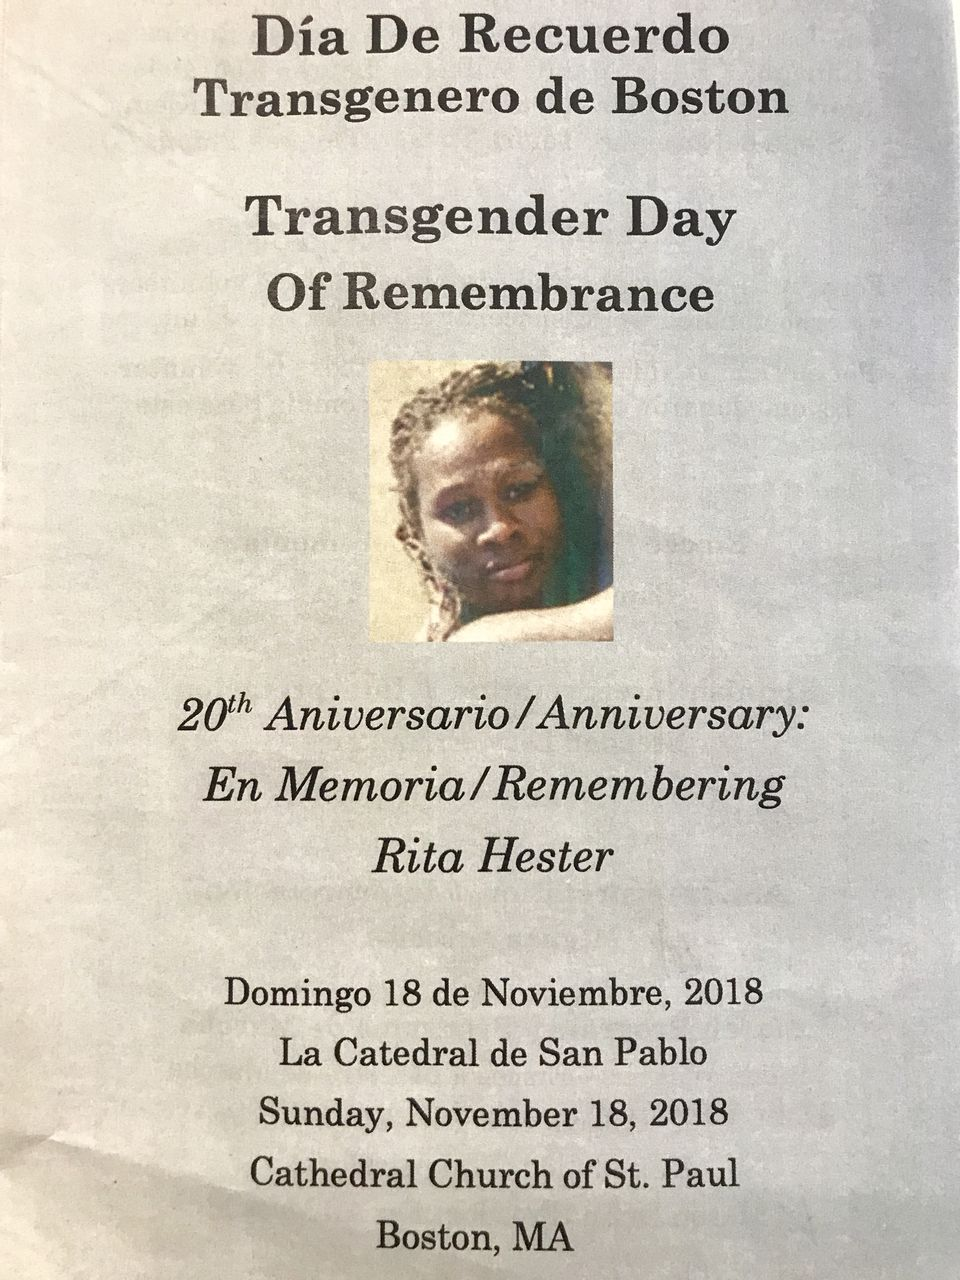 A pamphlet honoring Rita Hester.